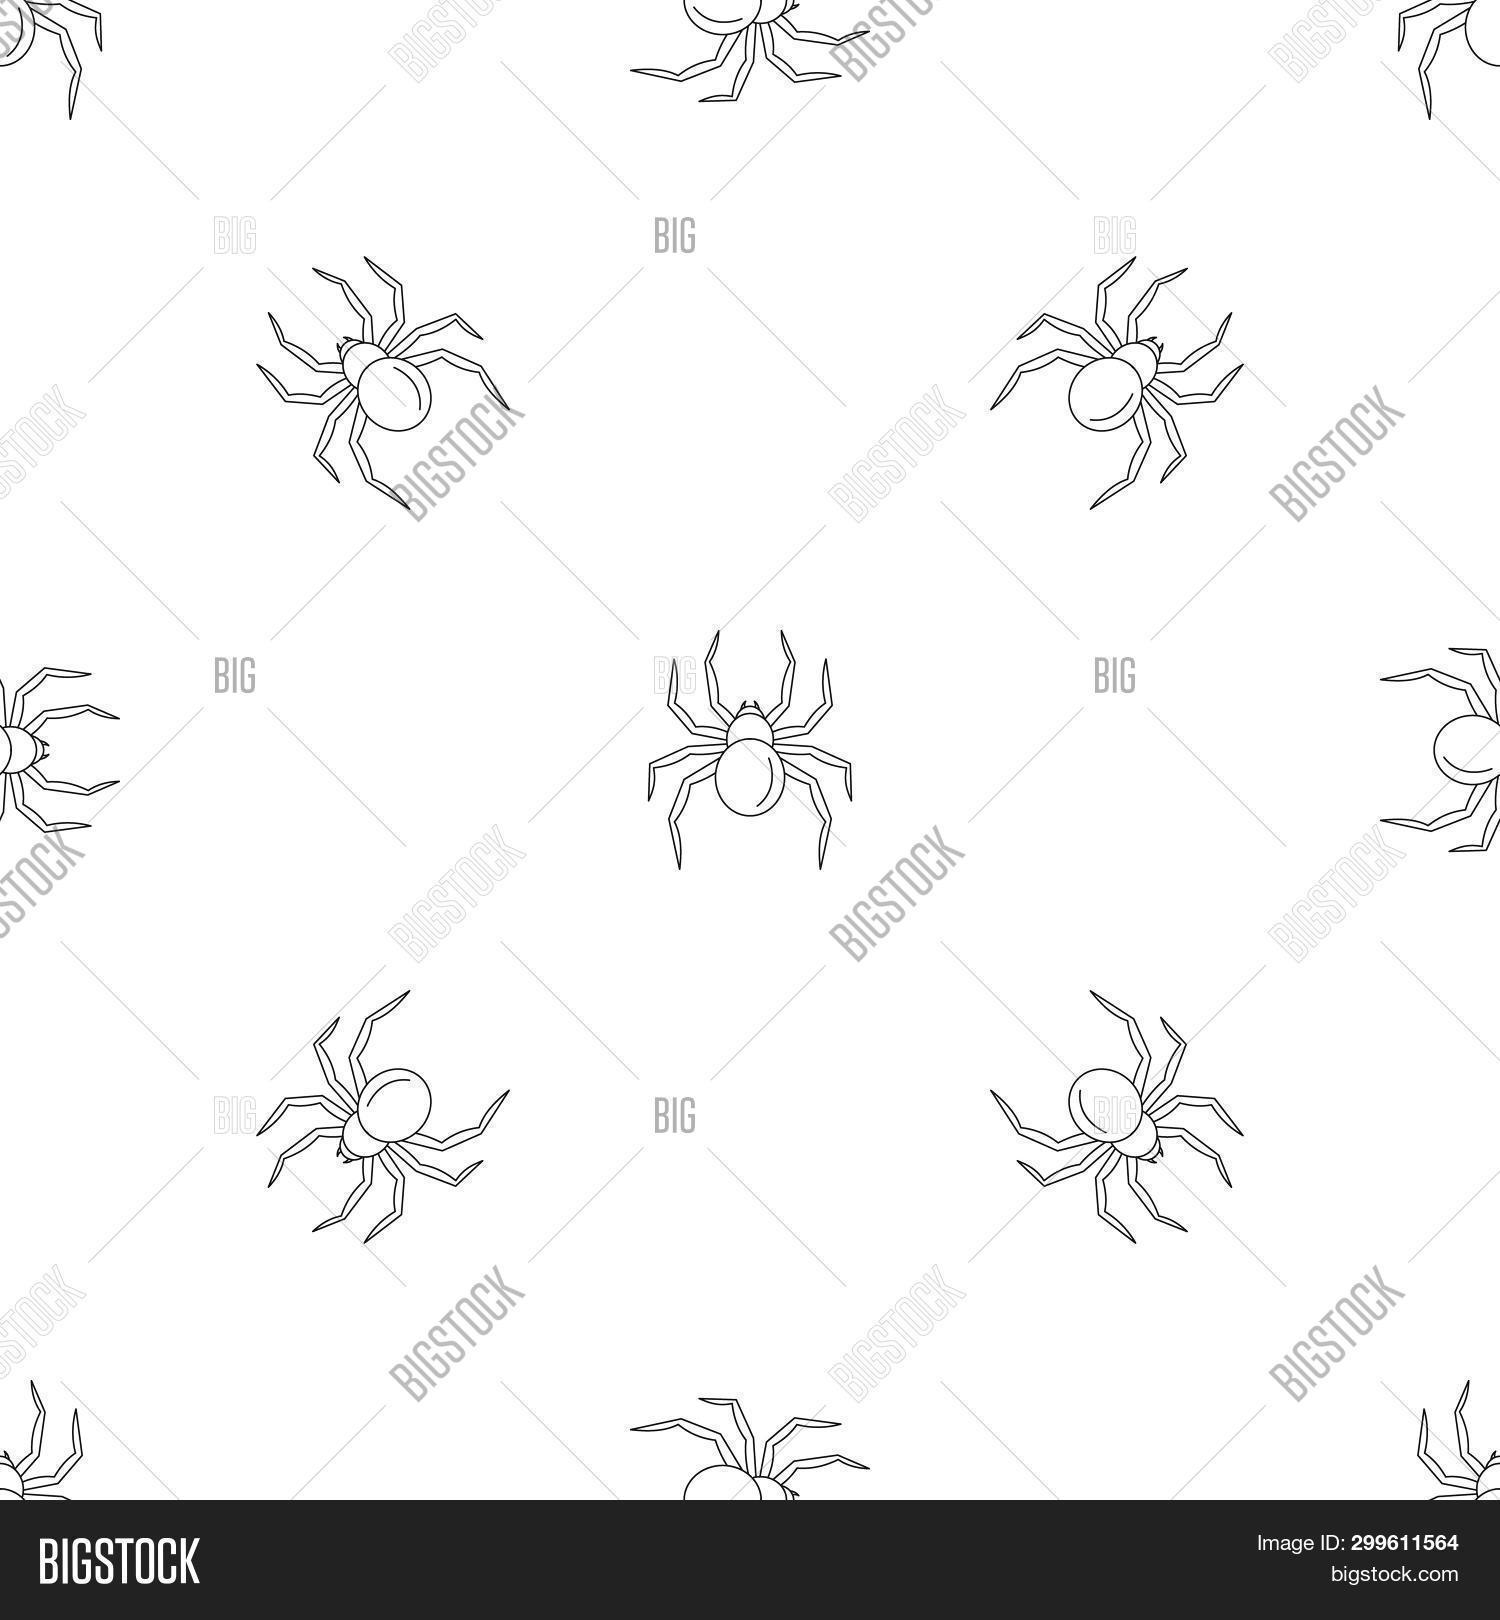 Black Widow Spider Image Photo Free Trial Bigstock